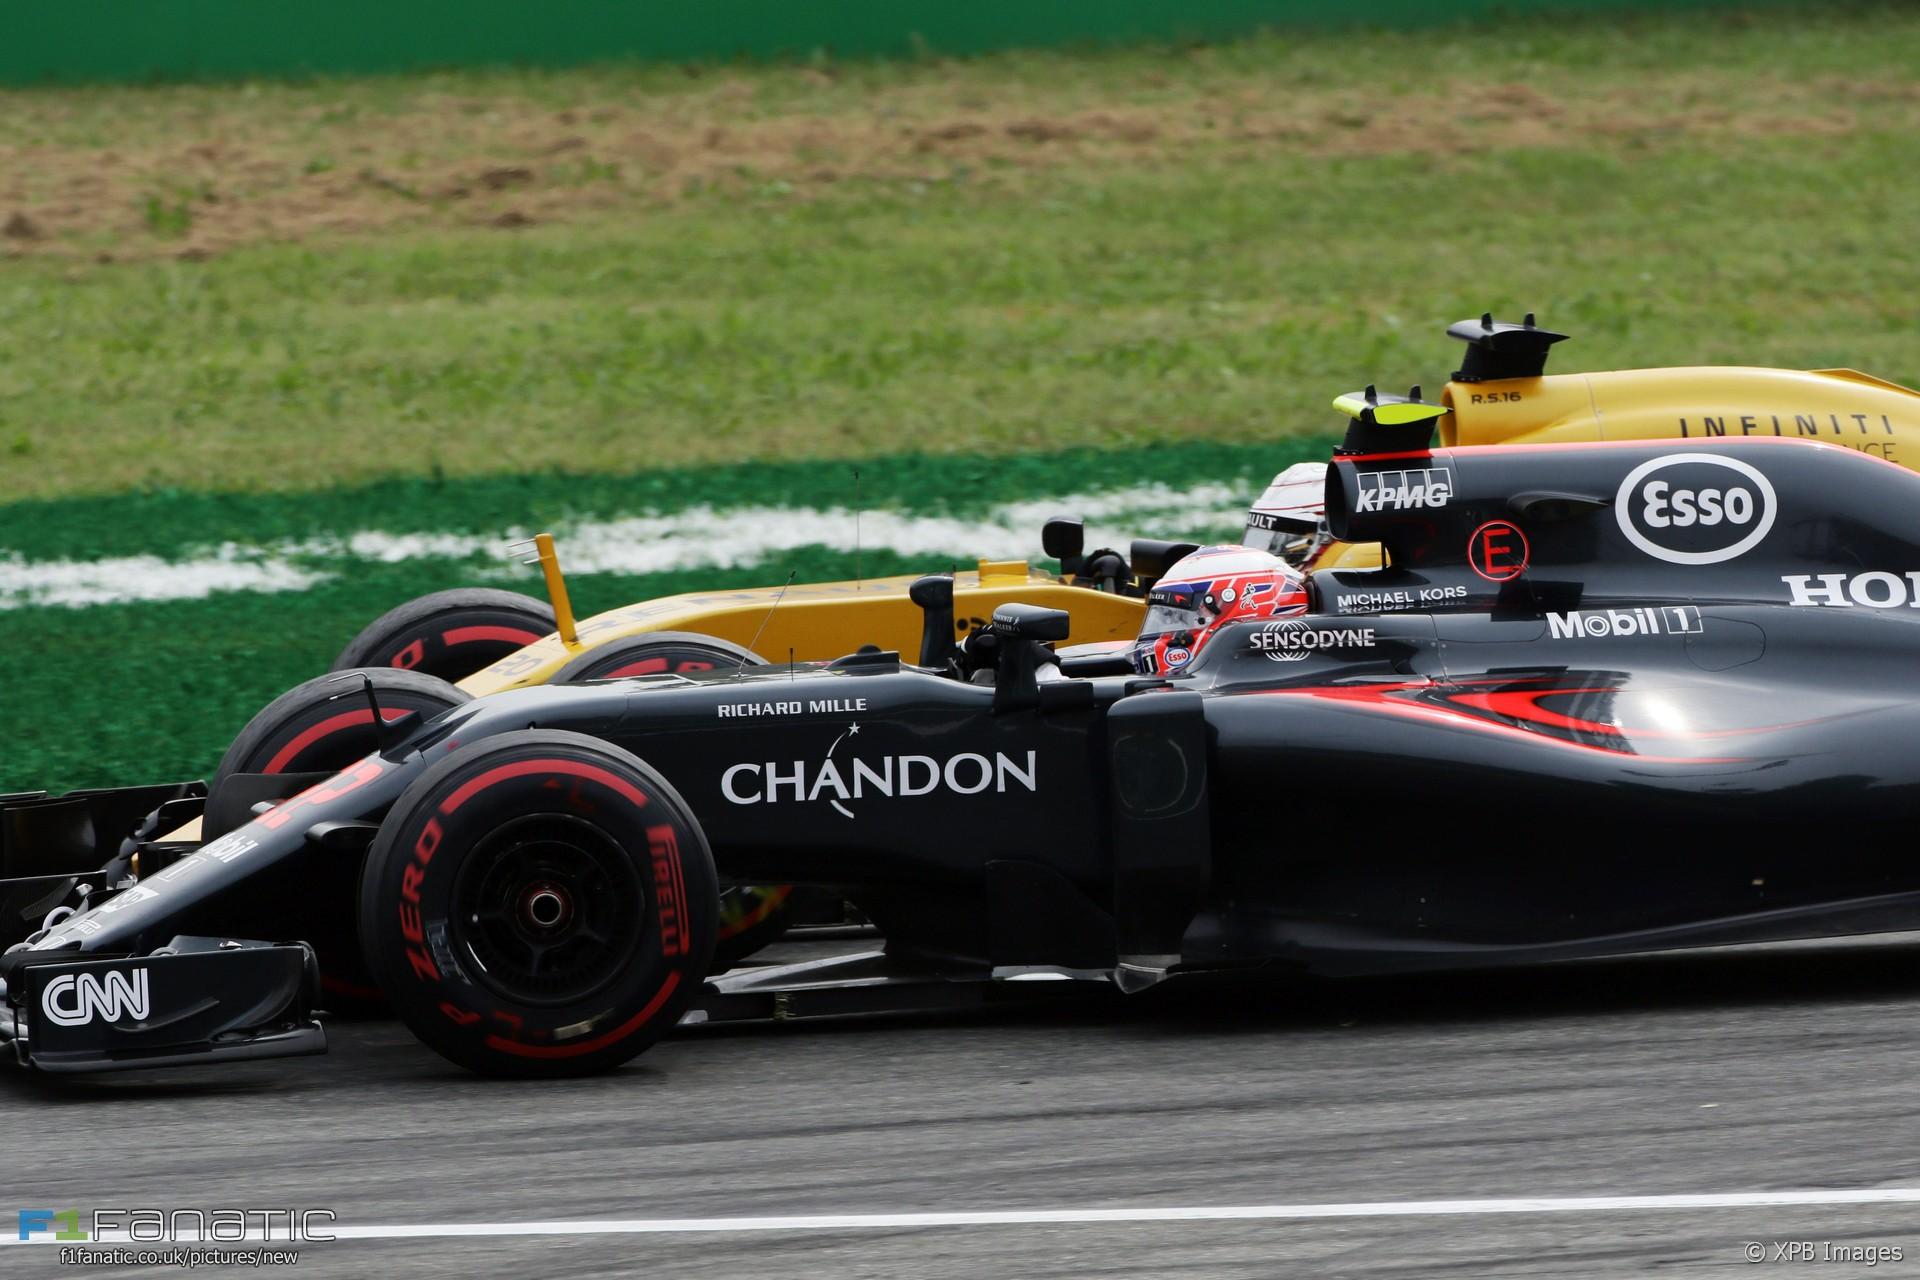 Jenson Button Mclaren Monza 2016 F1 Fanatic